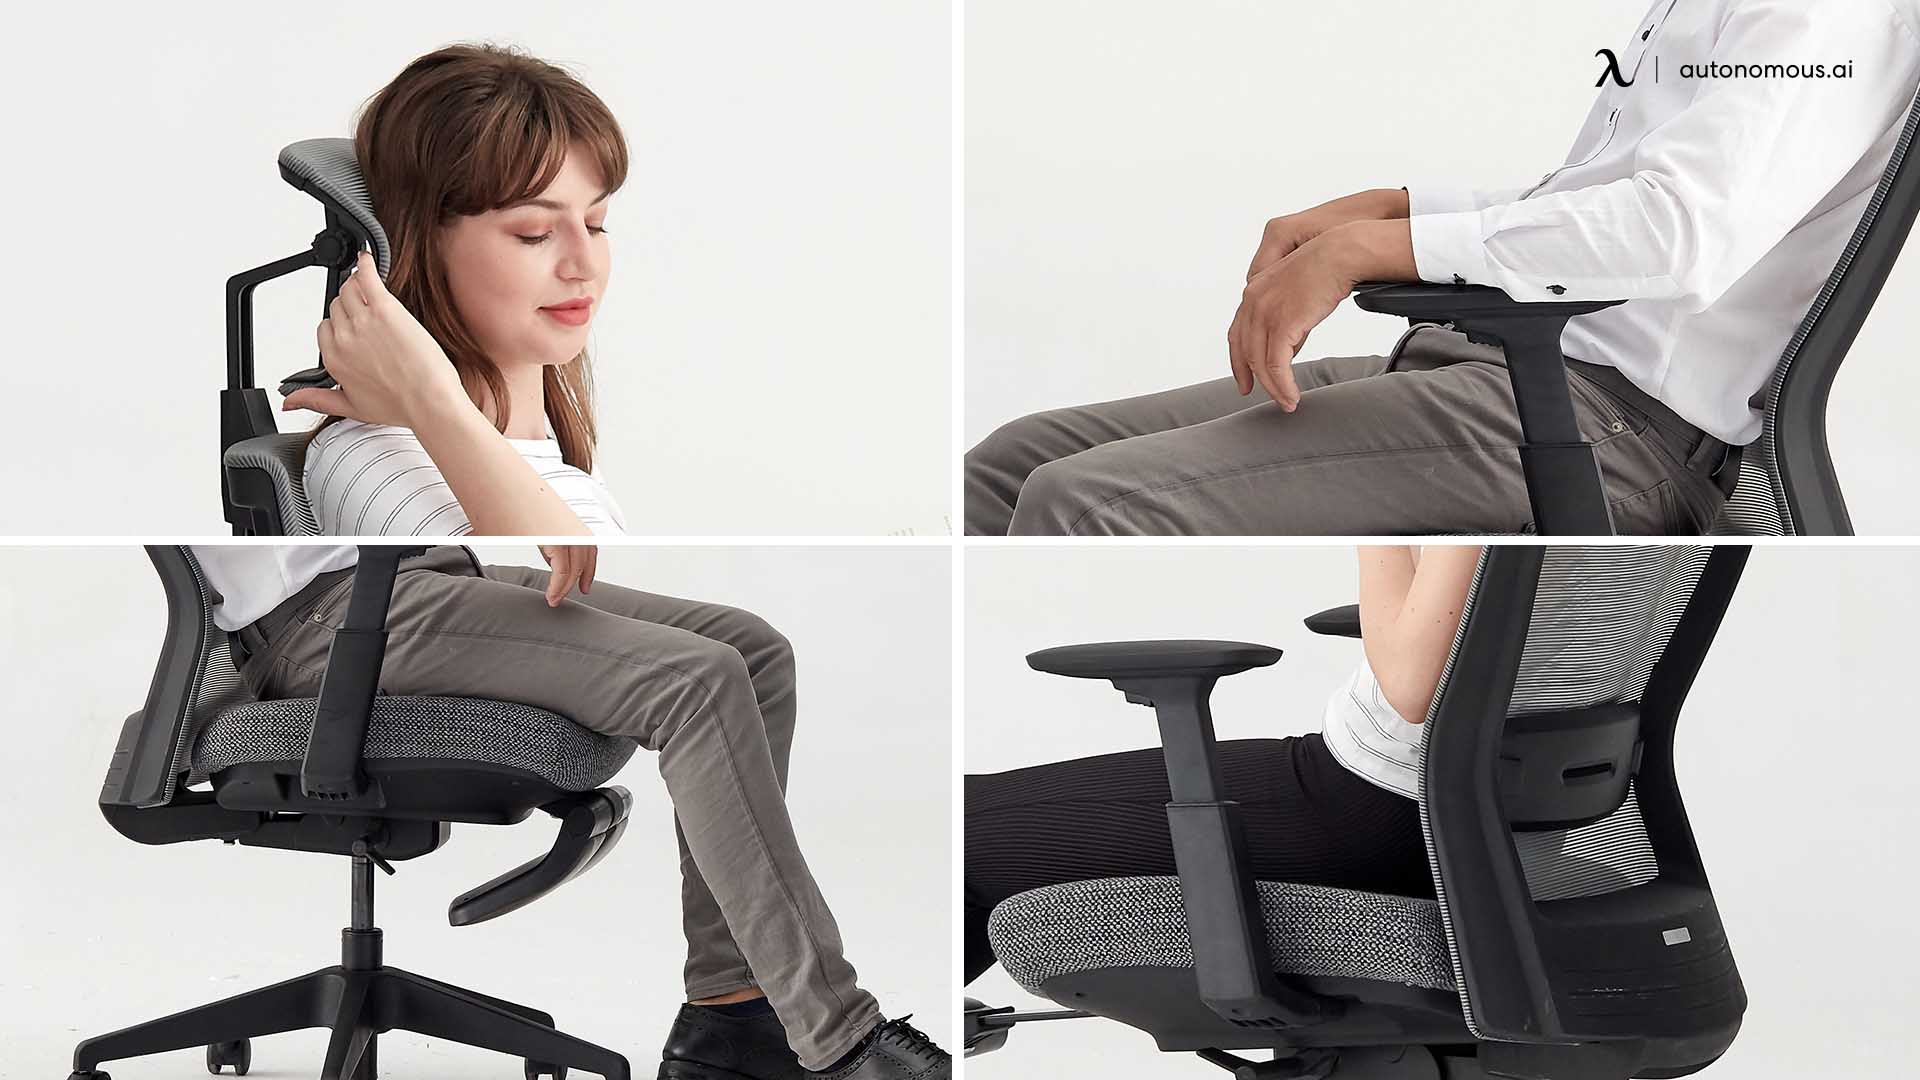 Customizable office chair with headrest